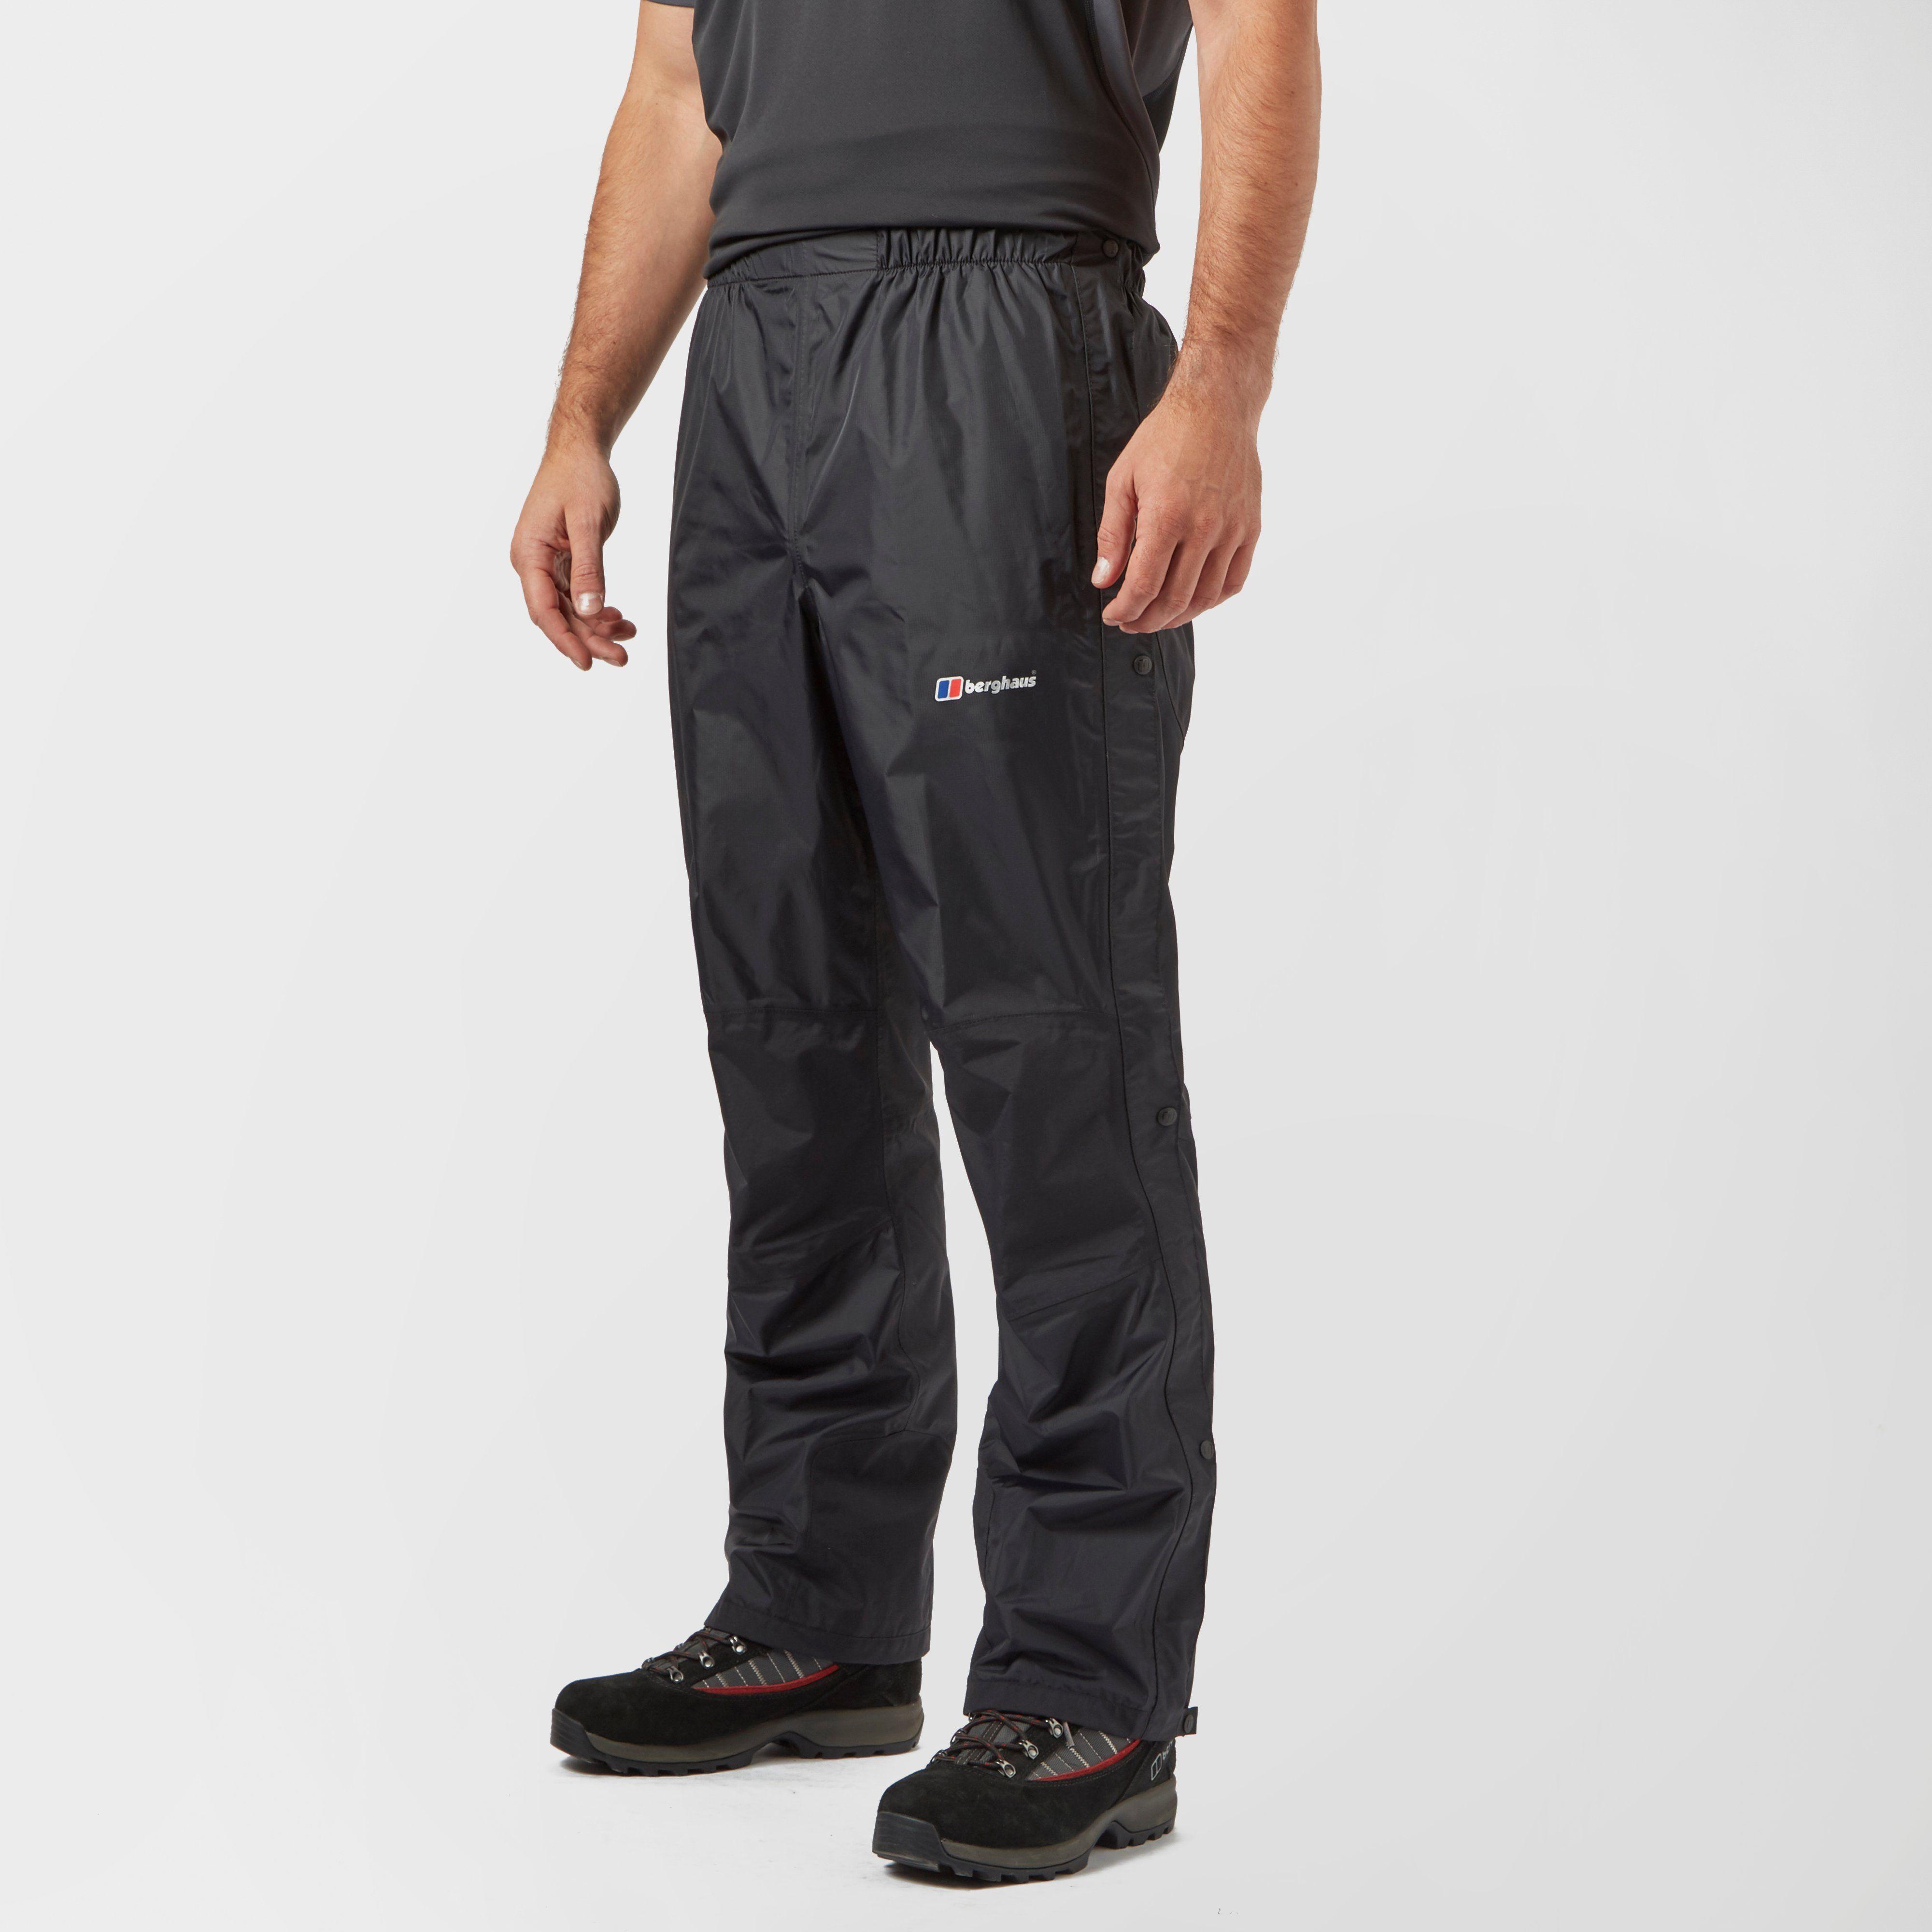 BERGHAUS Men's Drift Waterproof Trousers